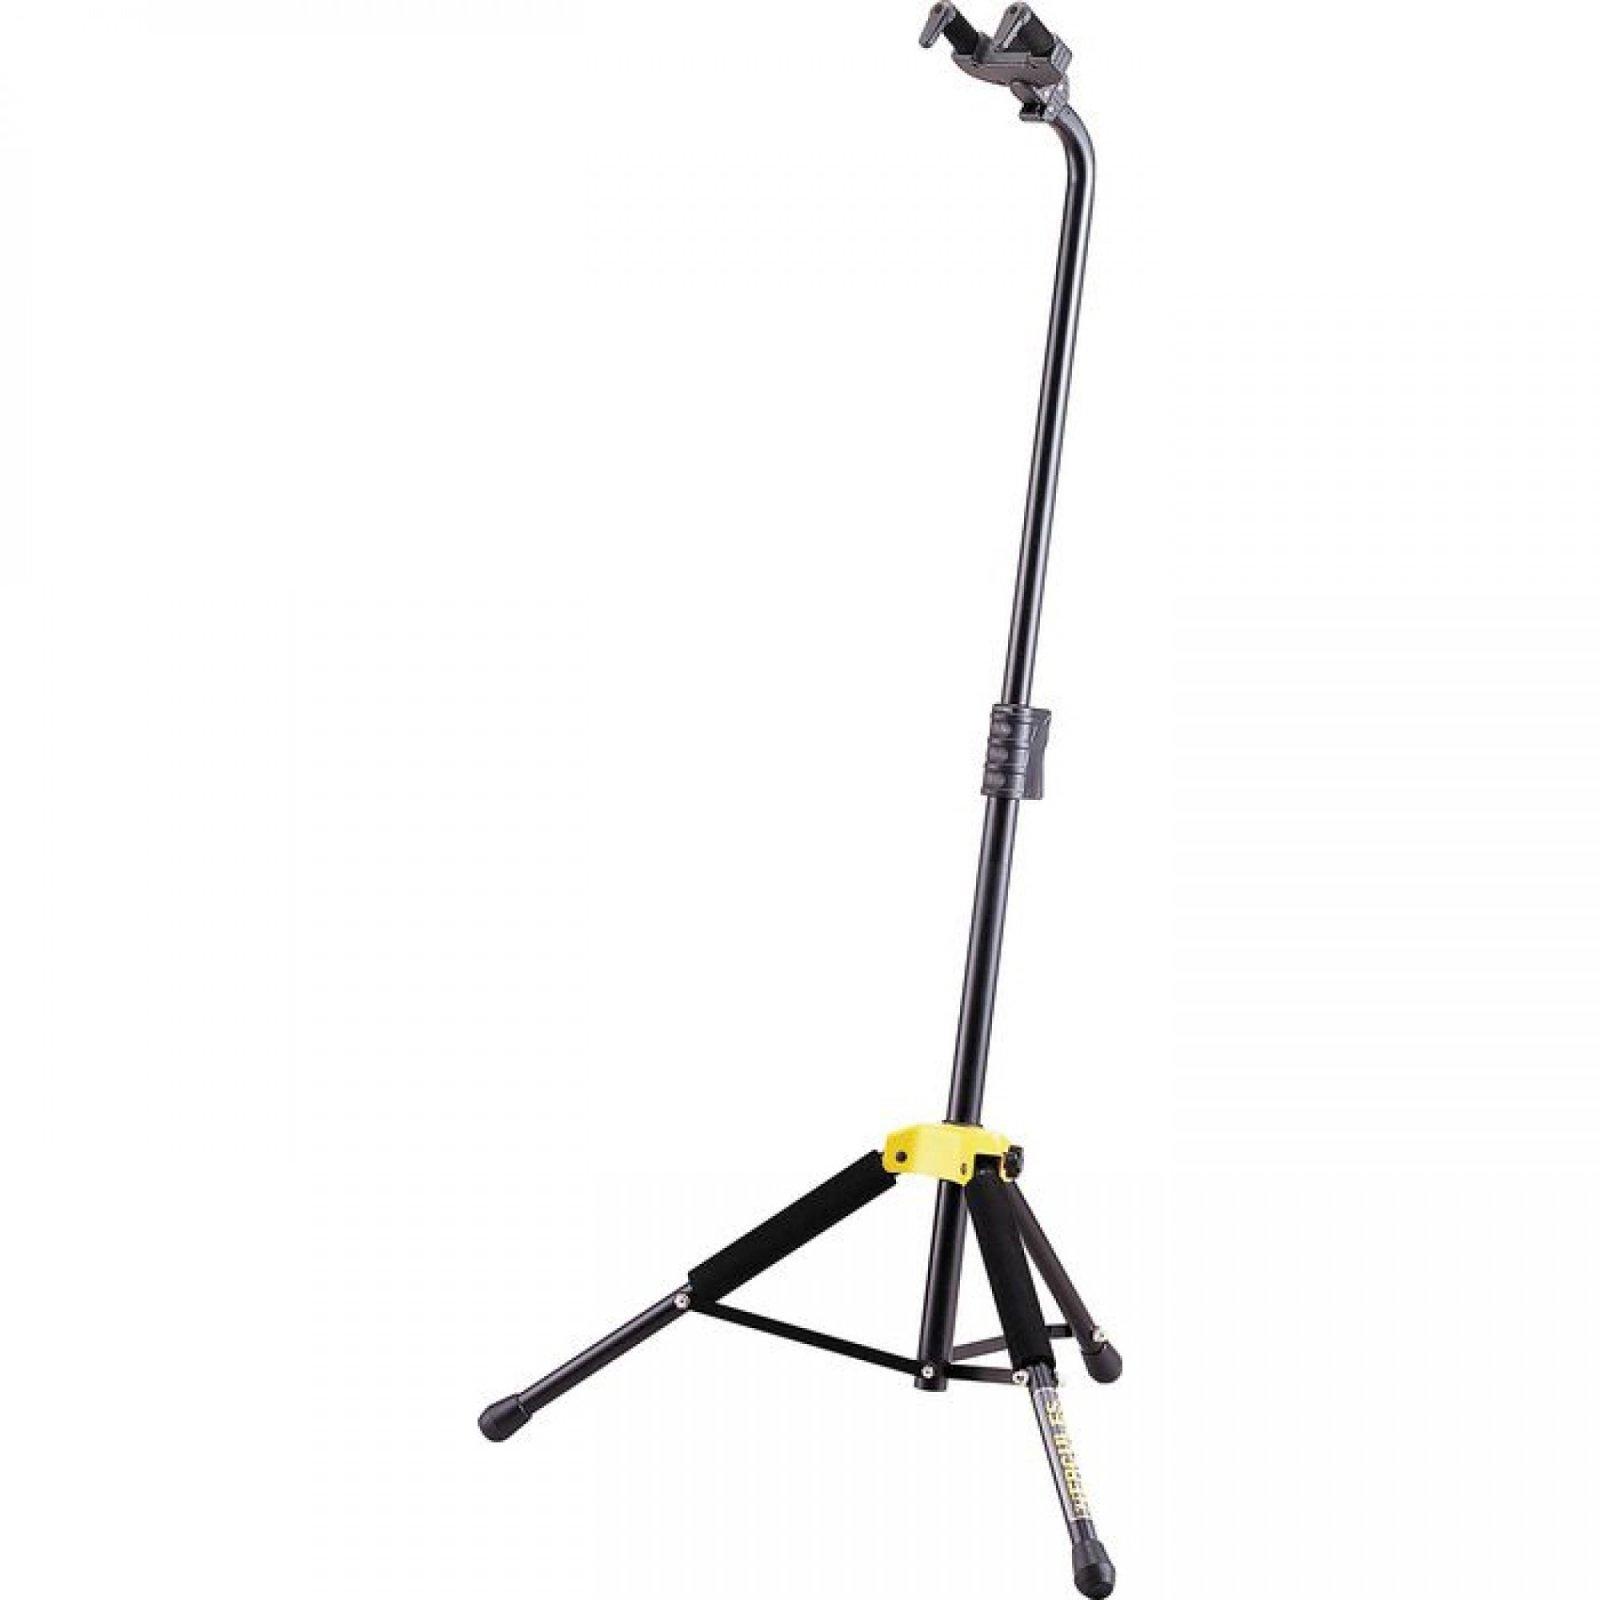 Hercules A/G (auto grip) Guitar Stand w/Folding Neck